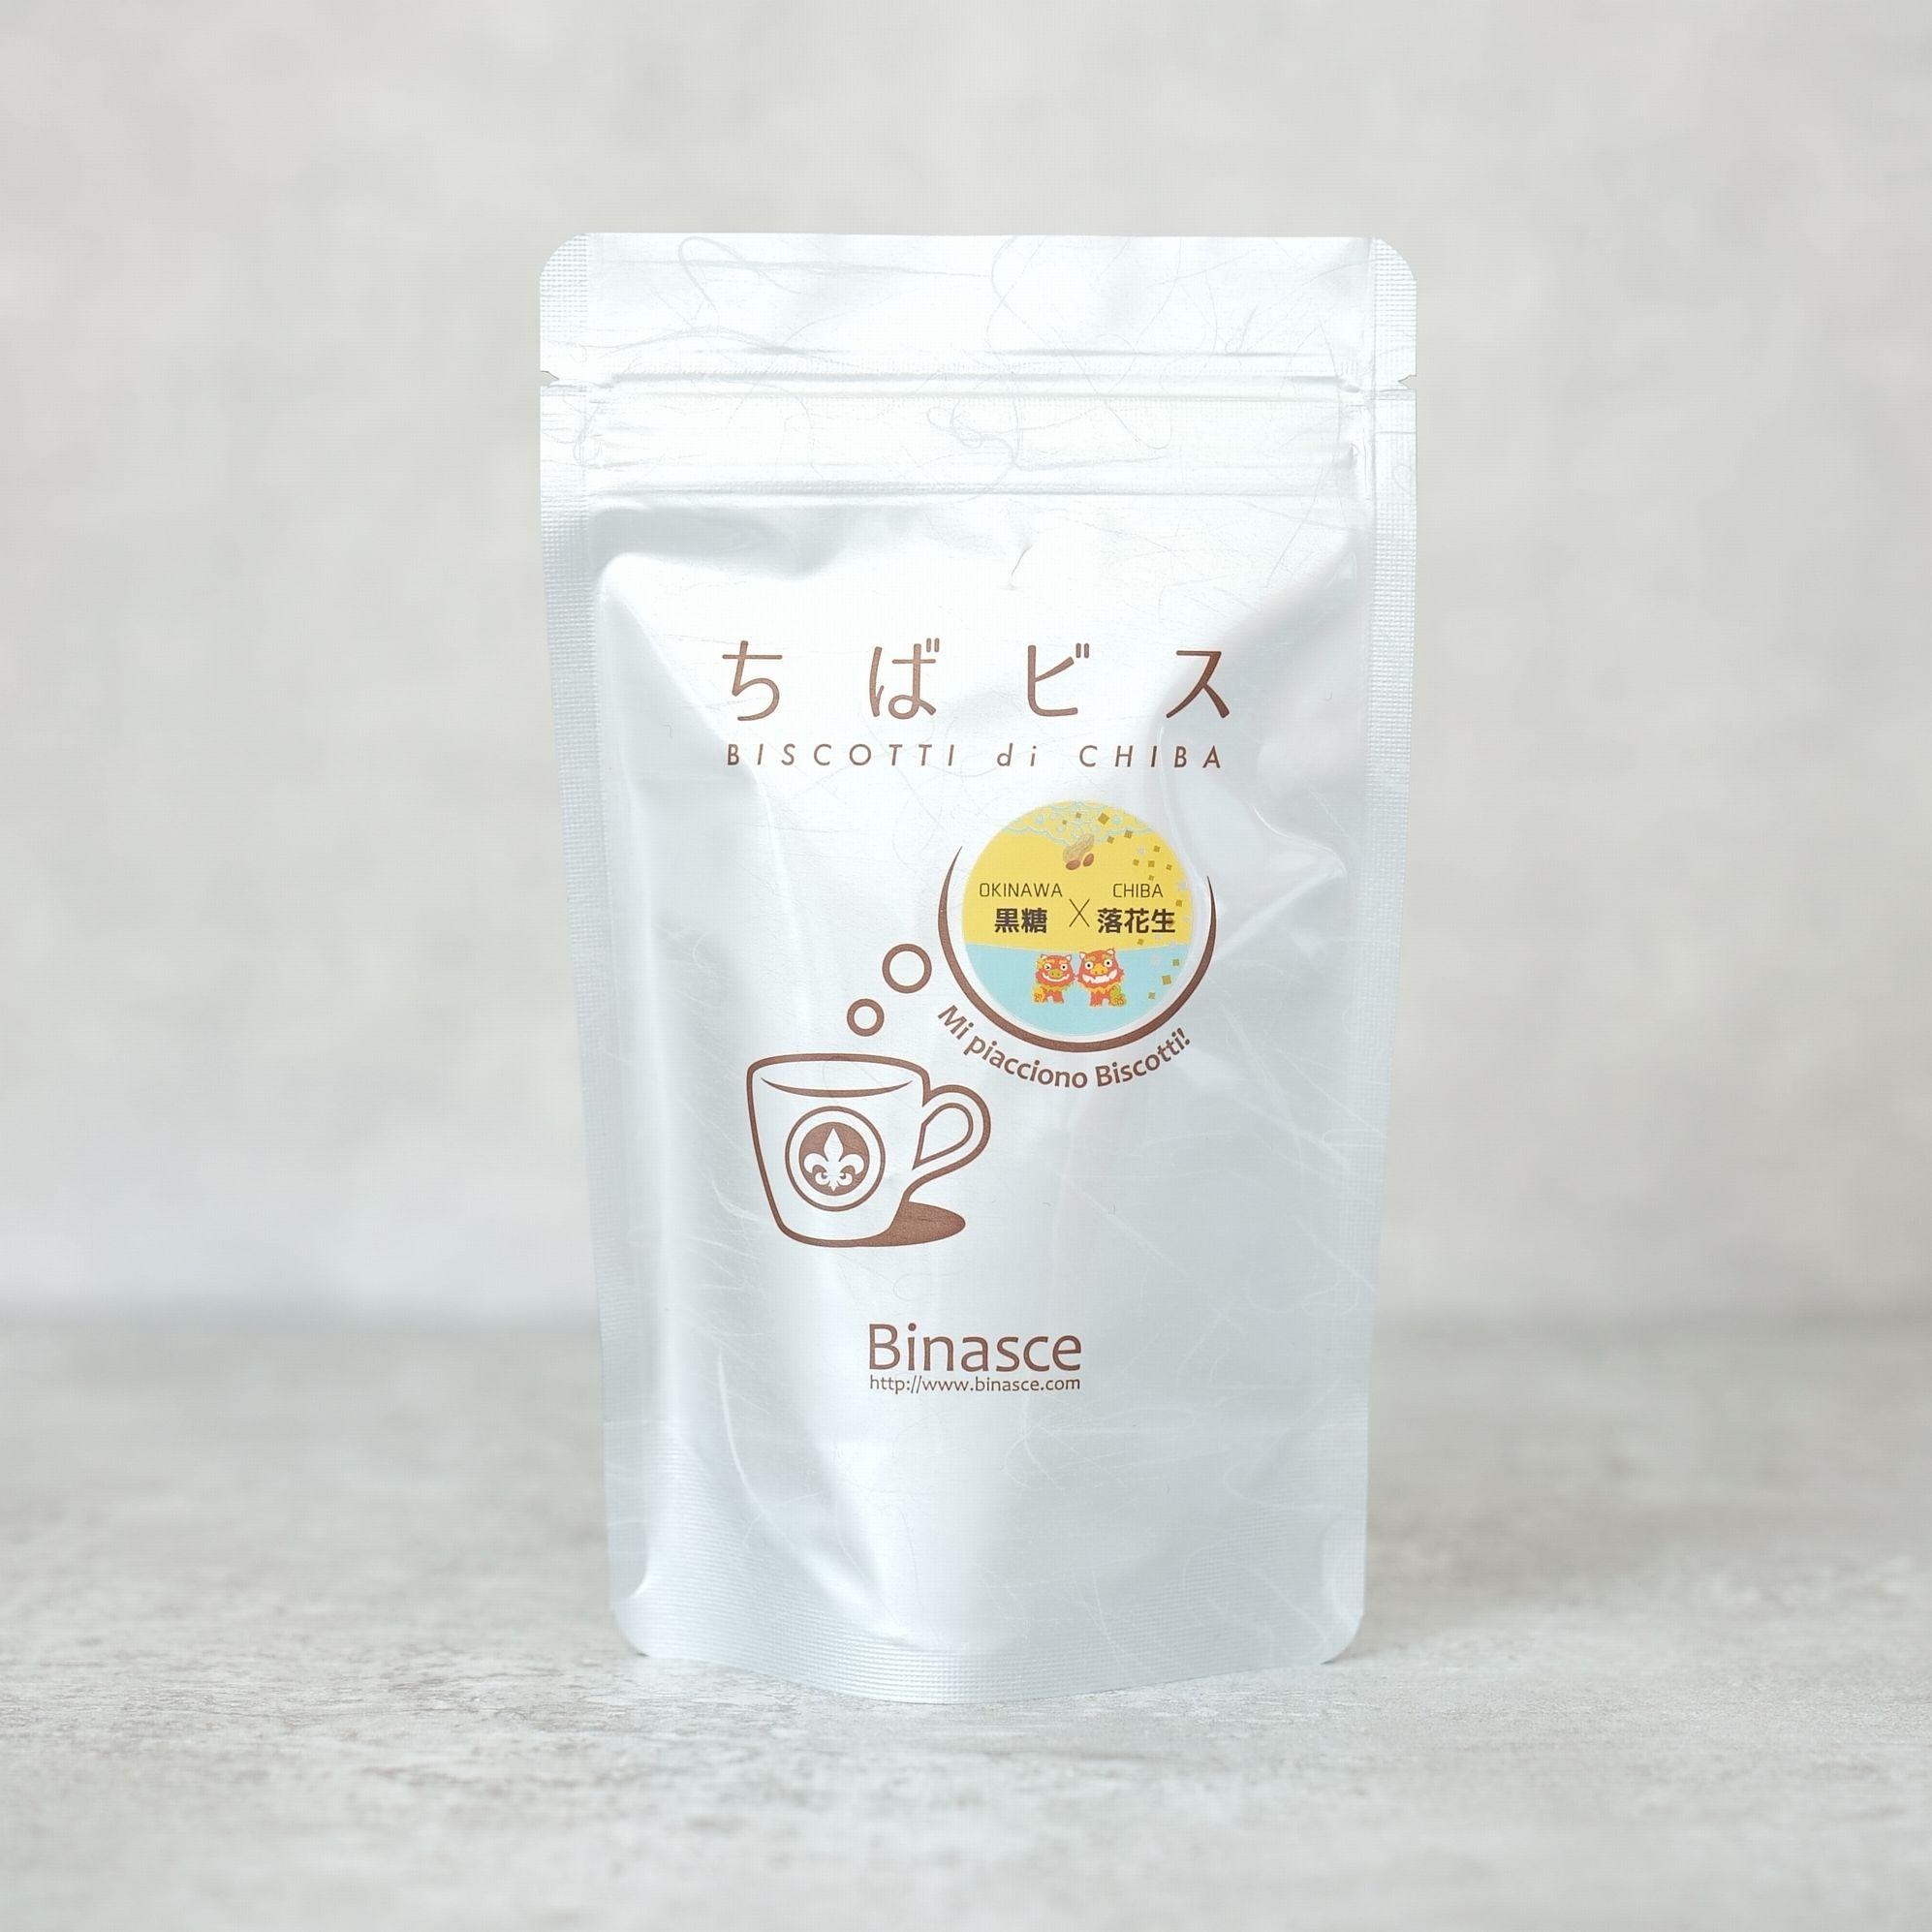 【Mサイズ】ちばビス 黒糖&落花生 70g ★千葉限定パッケージ★